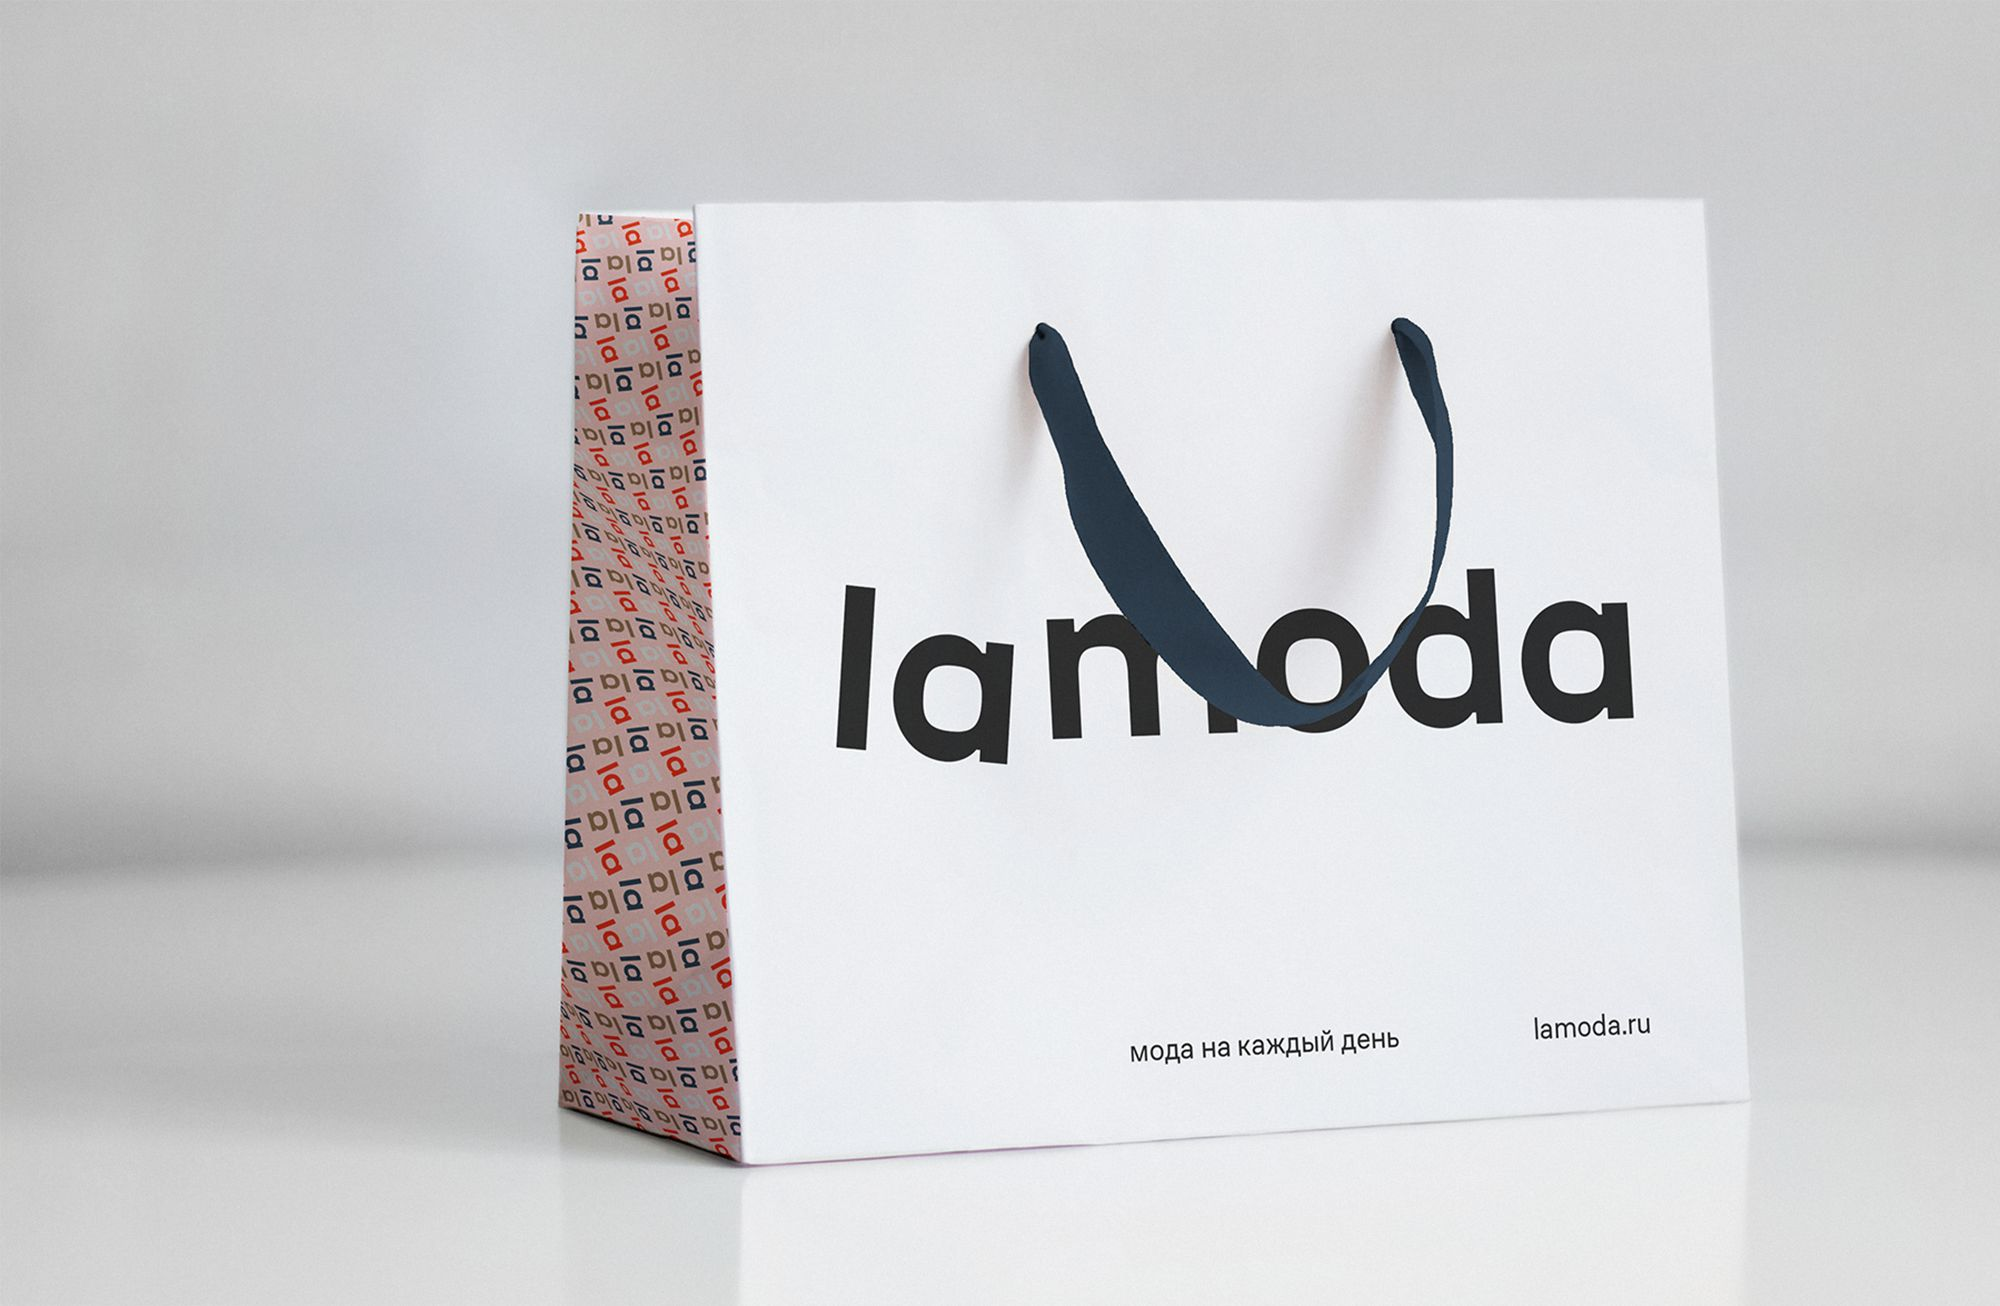 1ab4f3135372 Lamoda Group в первом квартале 2019г. продала товаров на 8 млрд ...